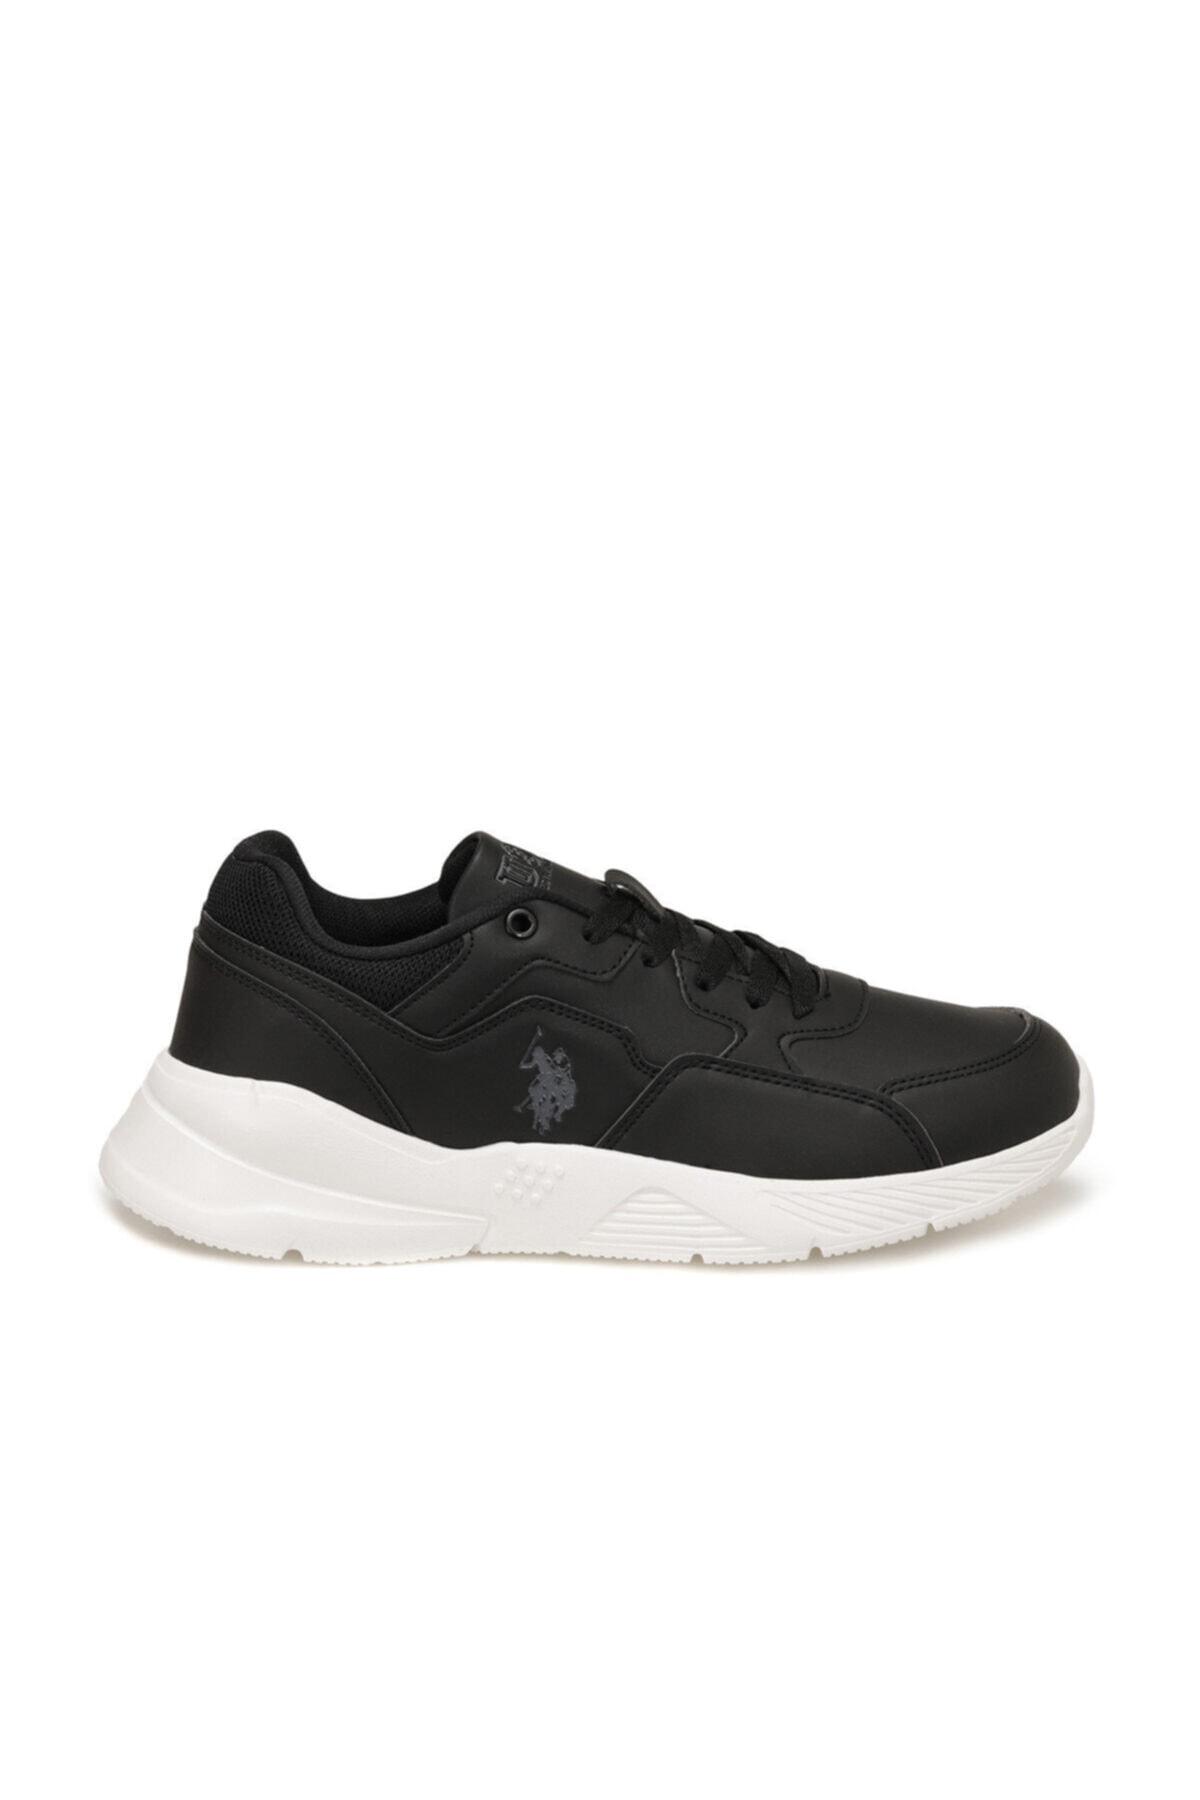 U.S. Polo Assn. FELIX Siyah Erkek Sneaker Ayakkabı 100536523 2